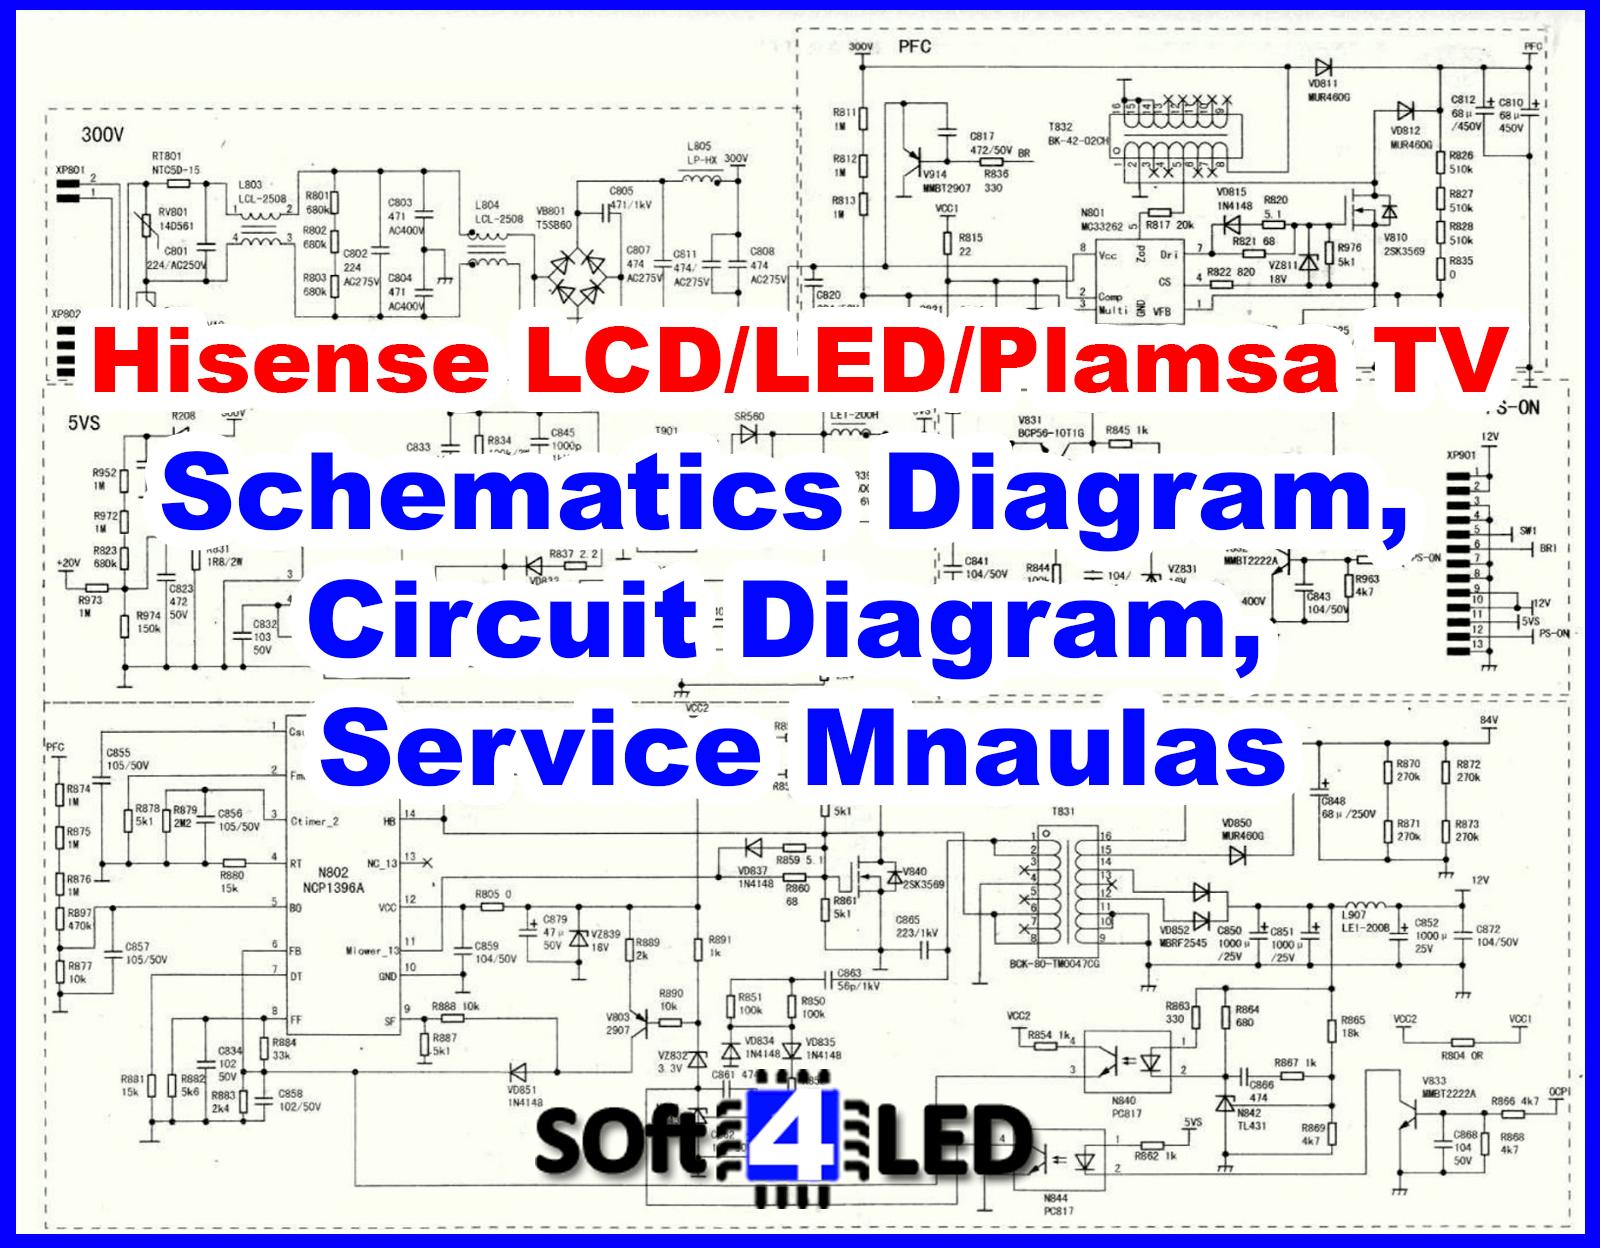 Hisense Lcd  Led  Plasma Tv Schematic Diagram  Circuit